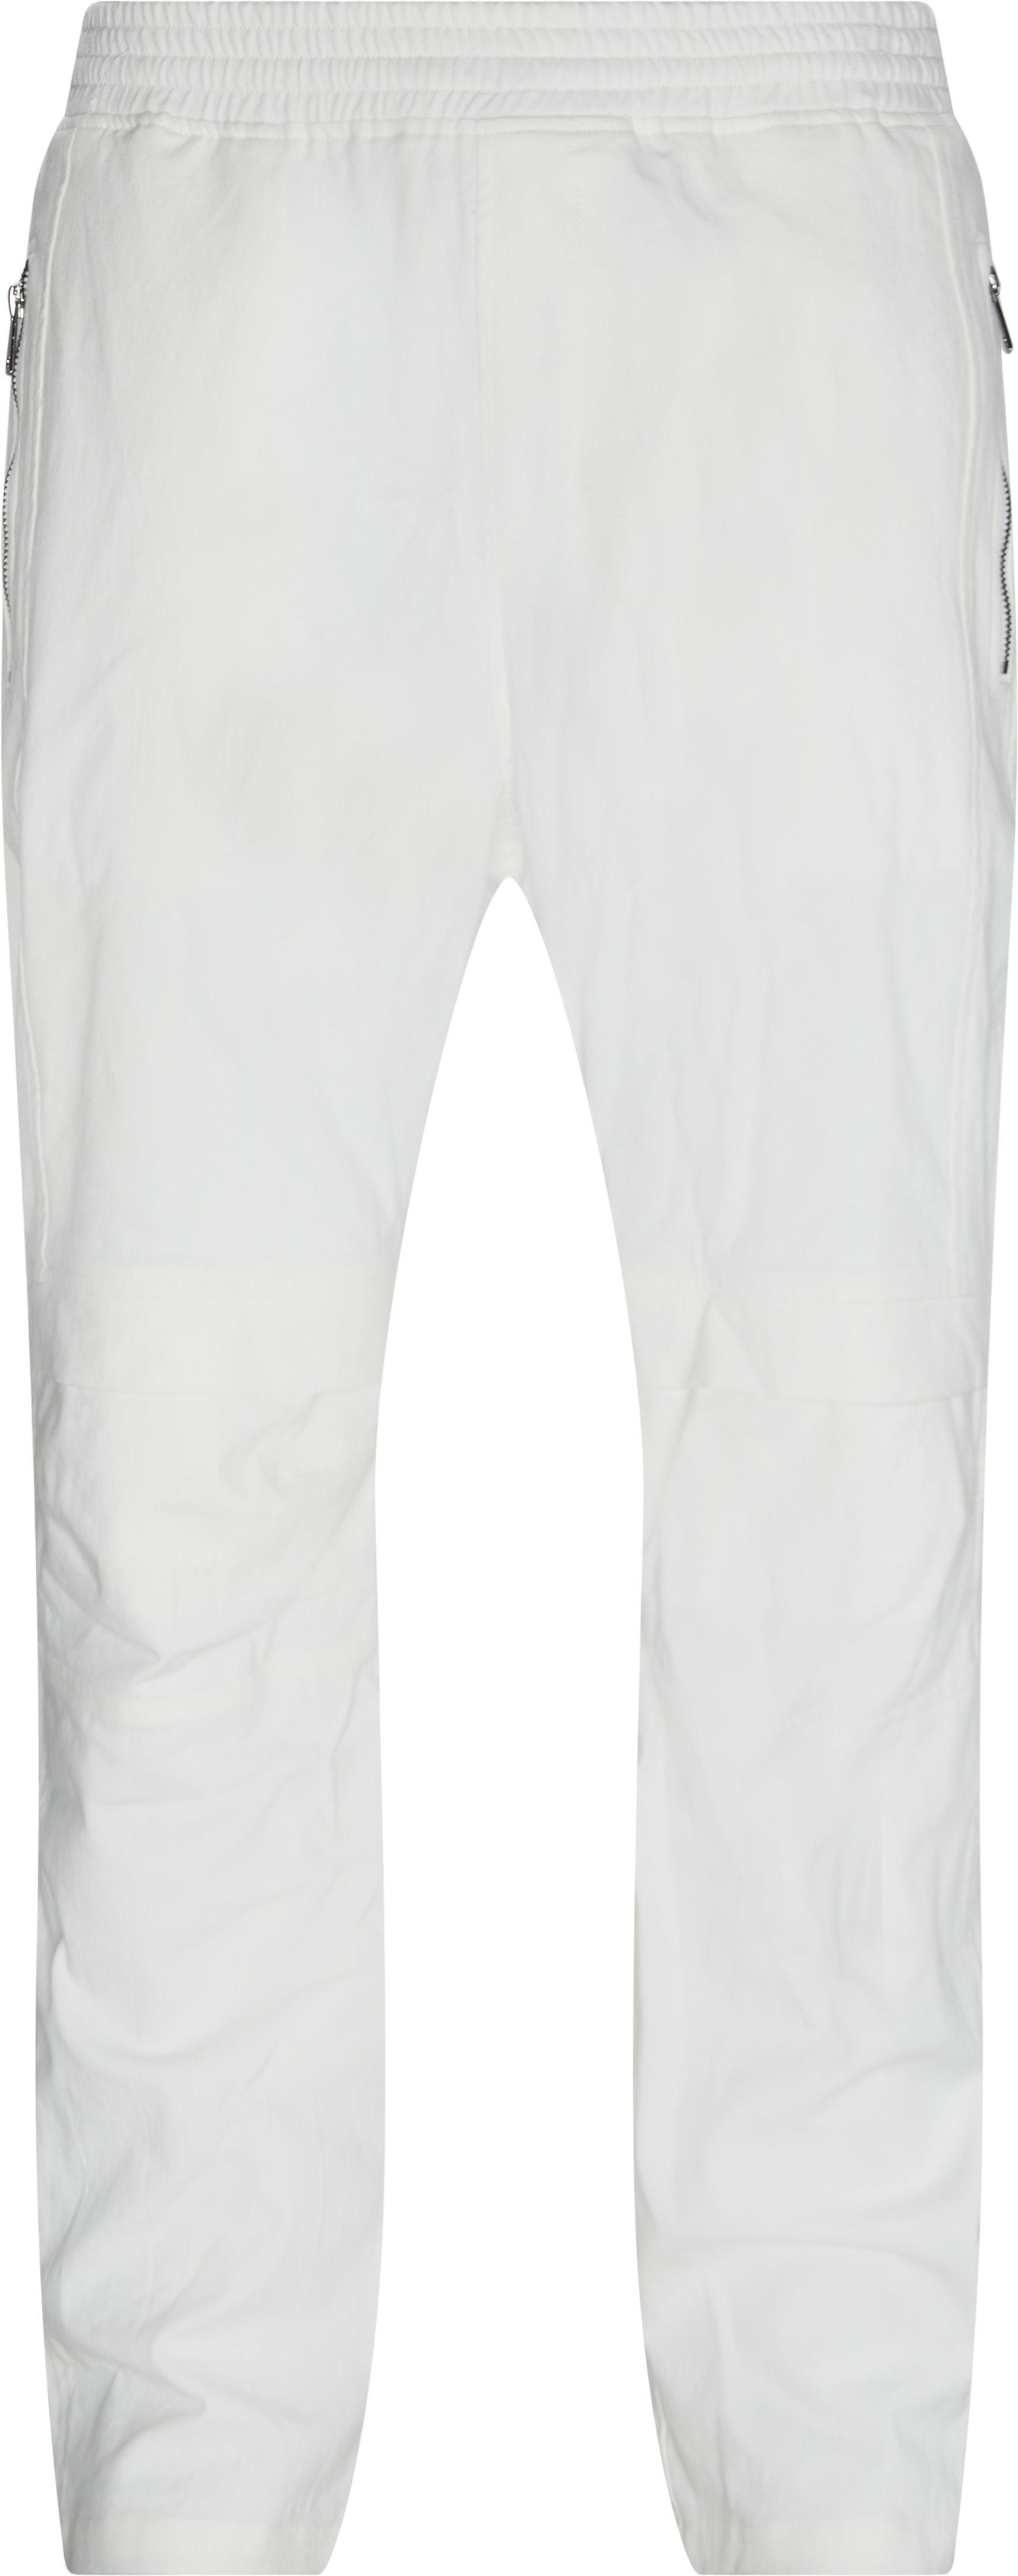 Felix Pants - Bukser - Regular fit - Hvid